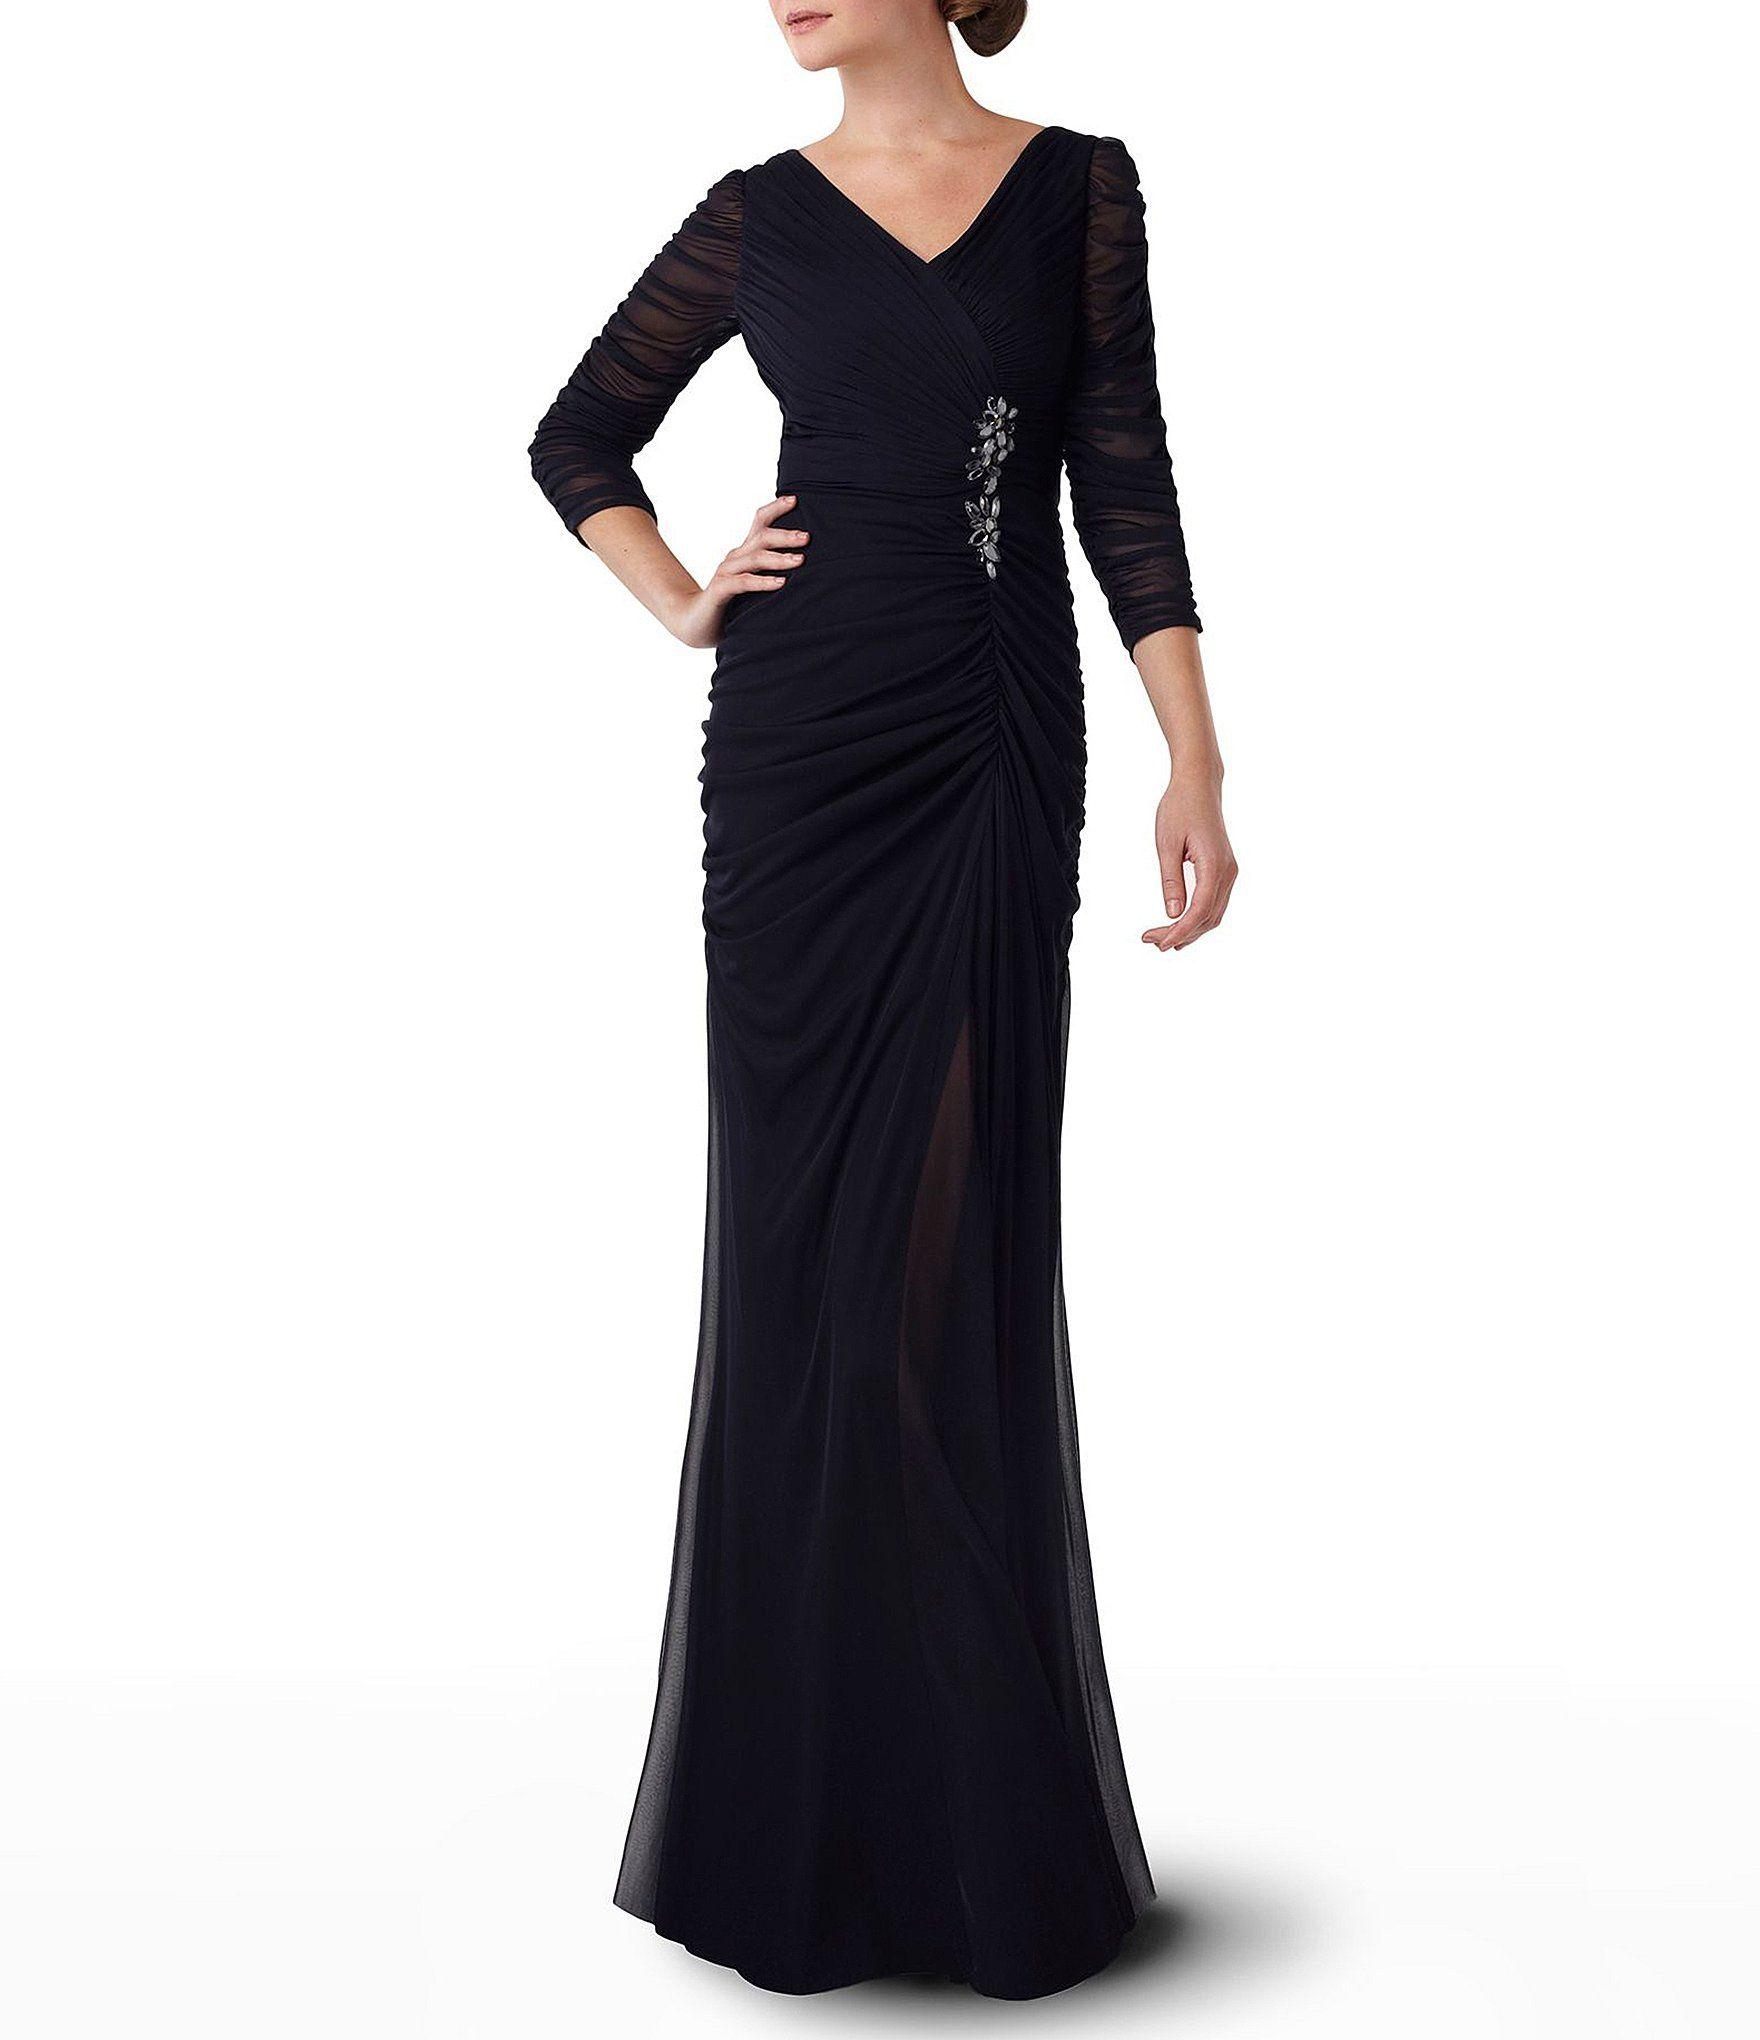 Adrianna Papell Plus Beaded Waist Gown   MOTHER DRESS   Pinterest ...